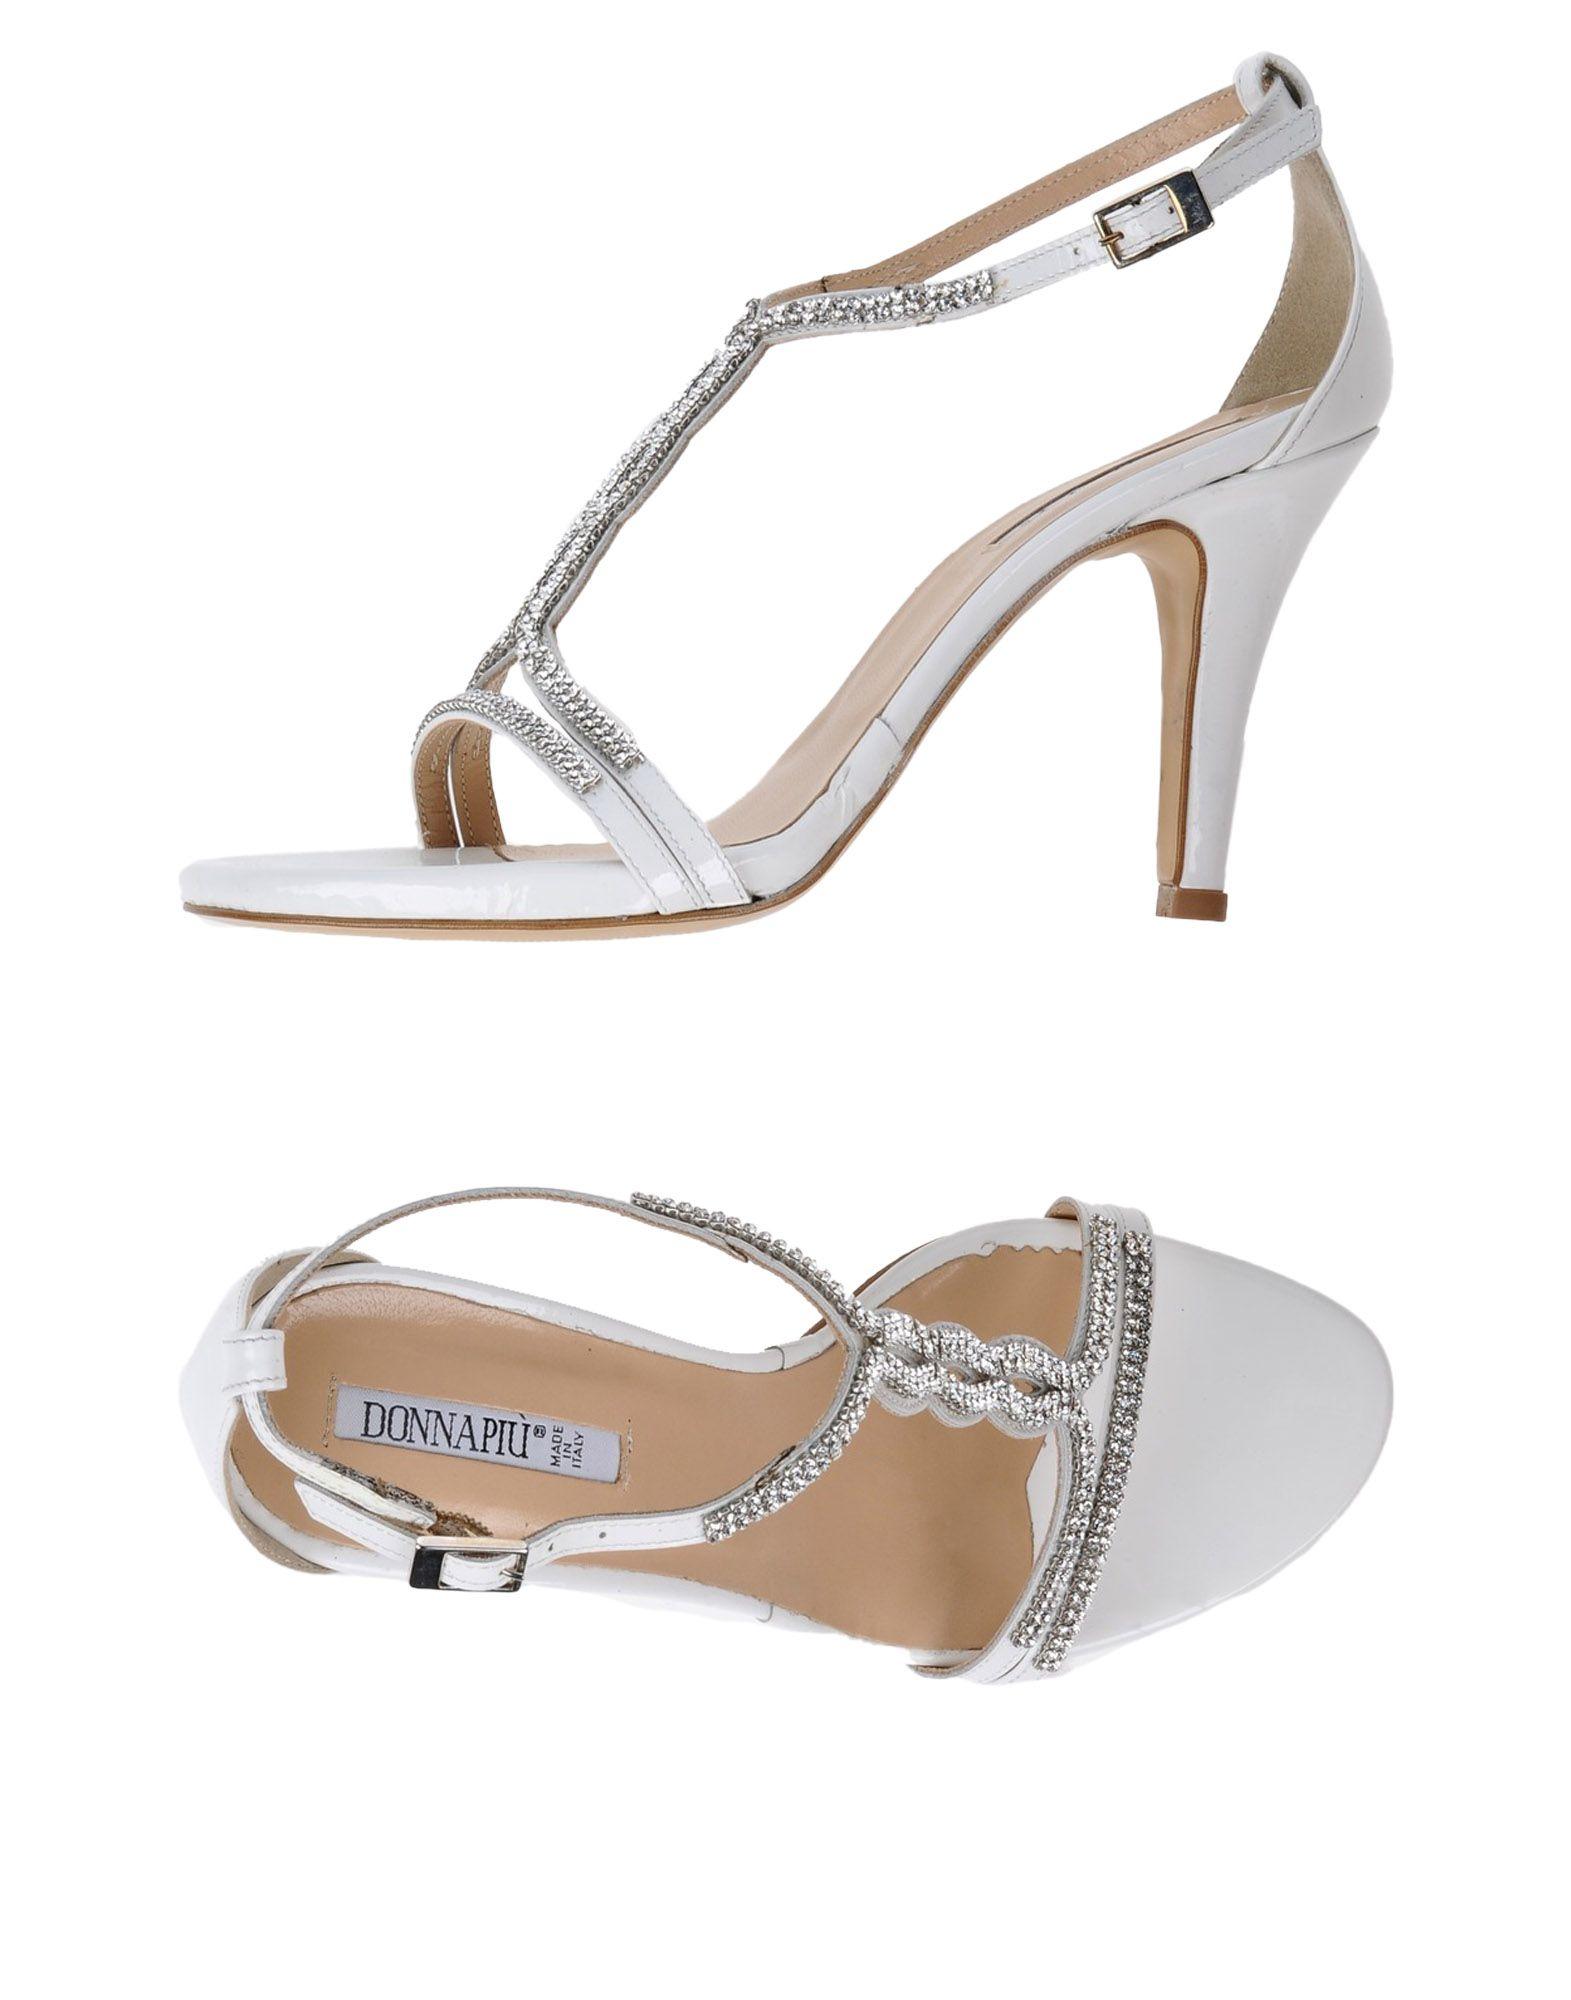 Donna Più Sandalen Damen  11338253MV Gute Qualität beliebte Schuhe